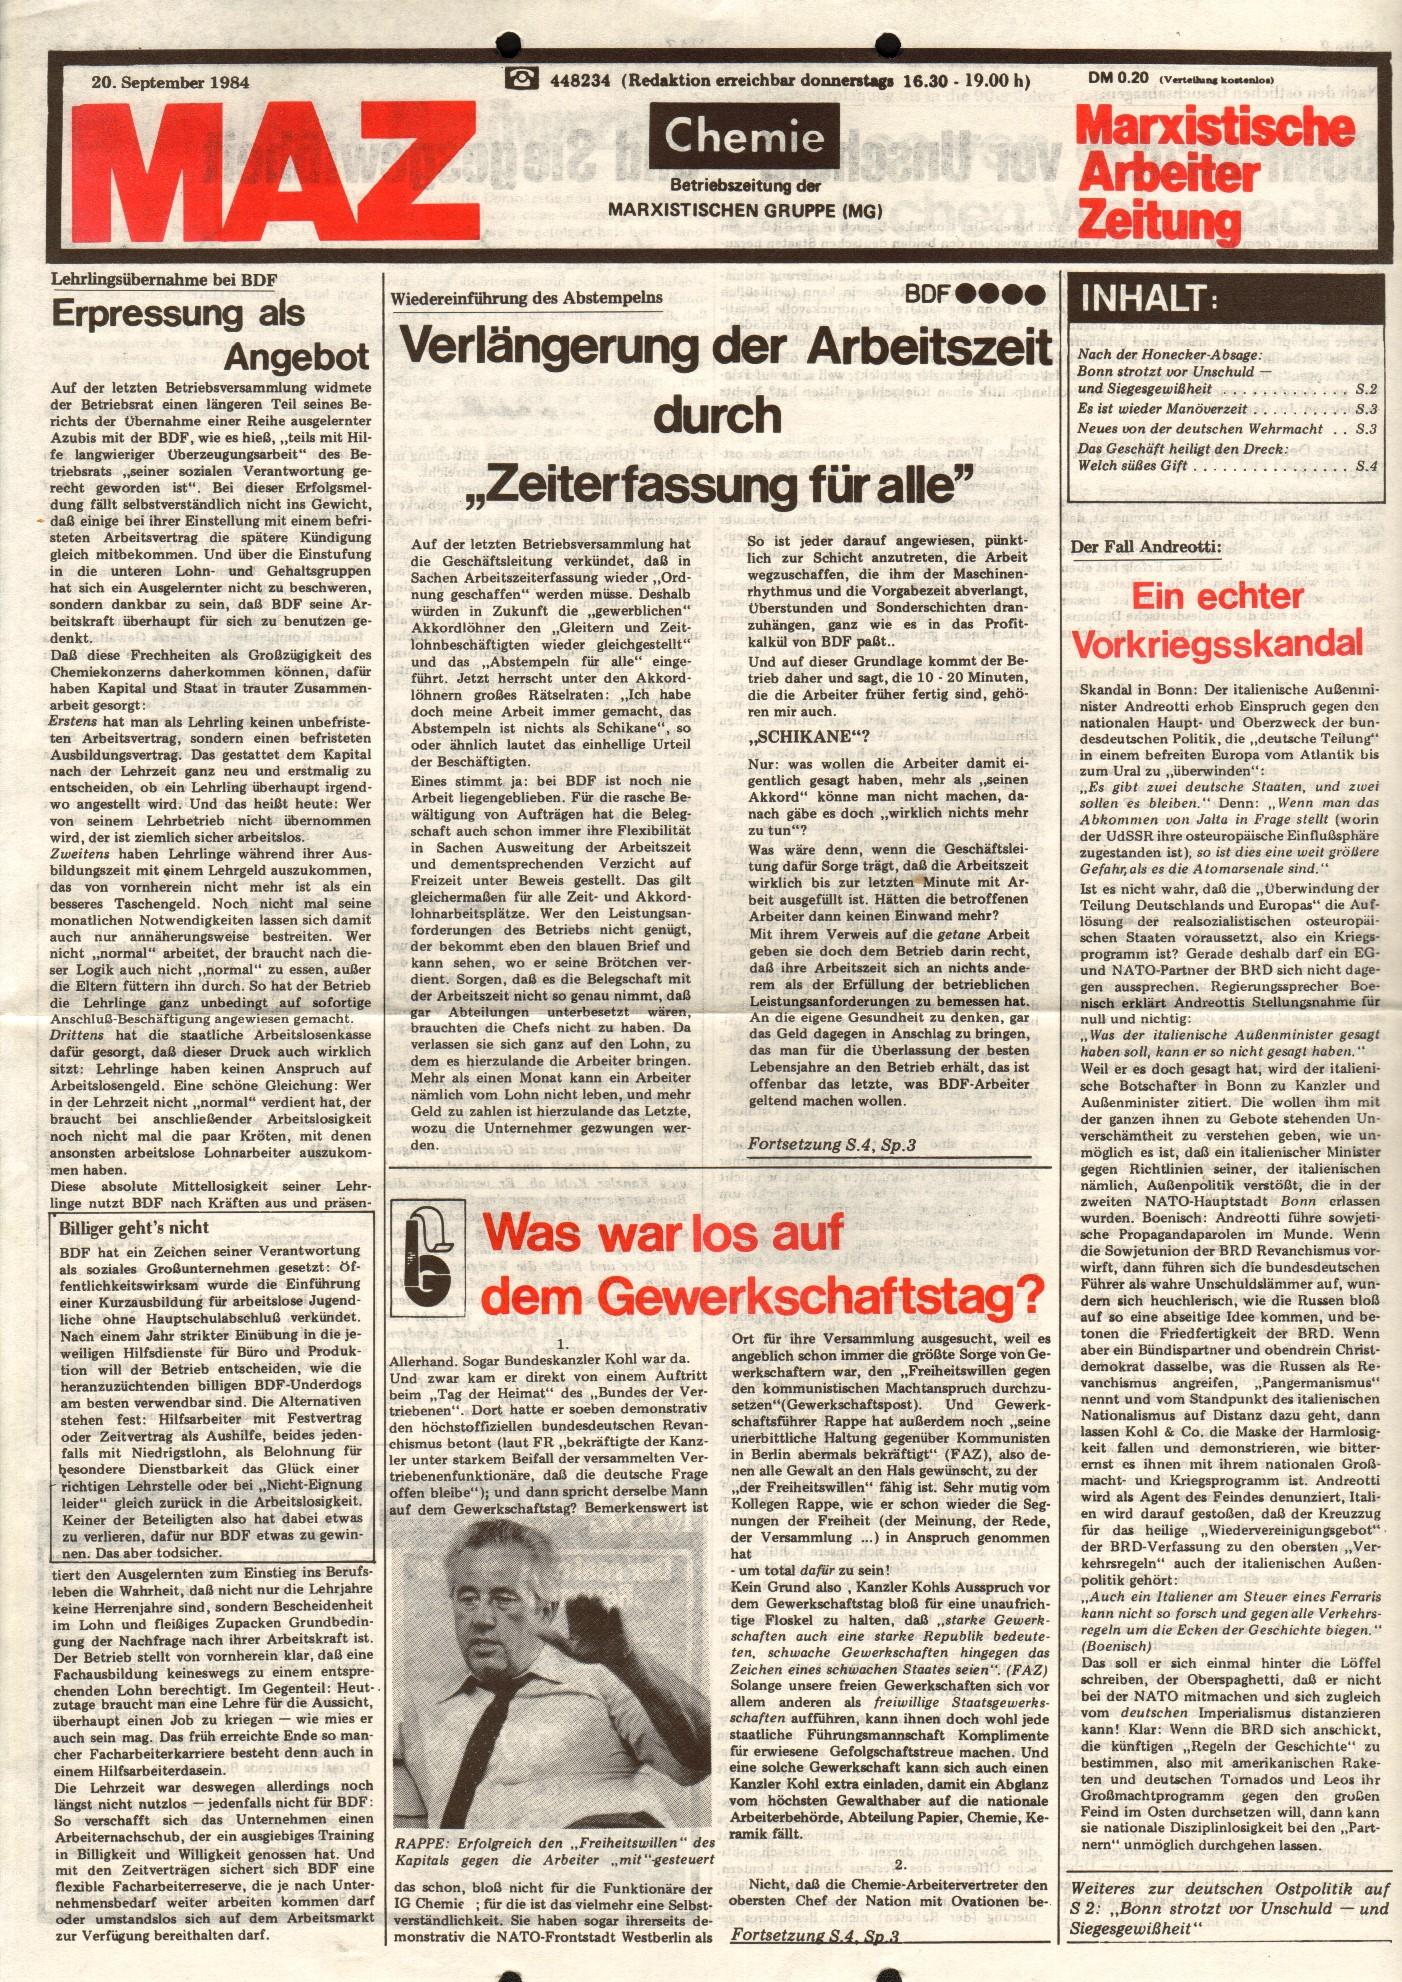 Hamburg_MG_MAZ_Chemie_19840920_01